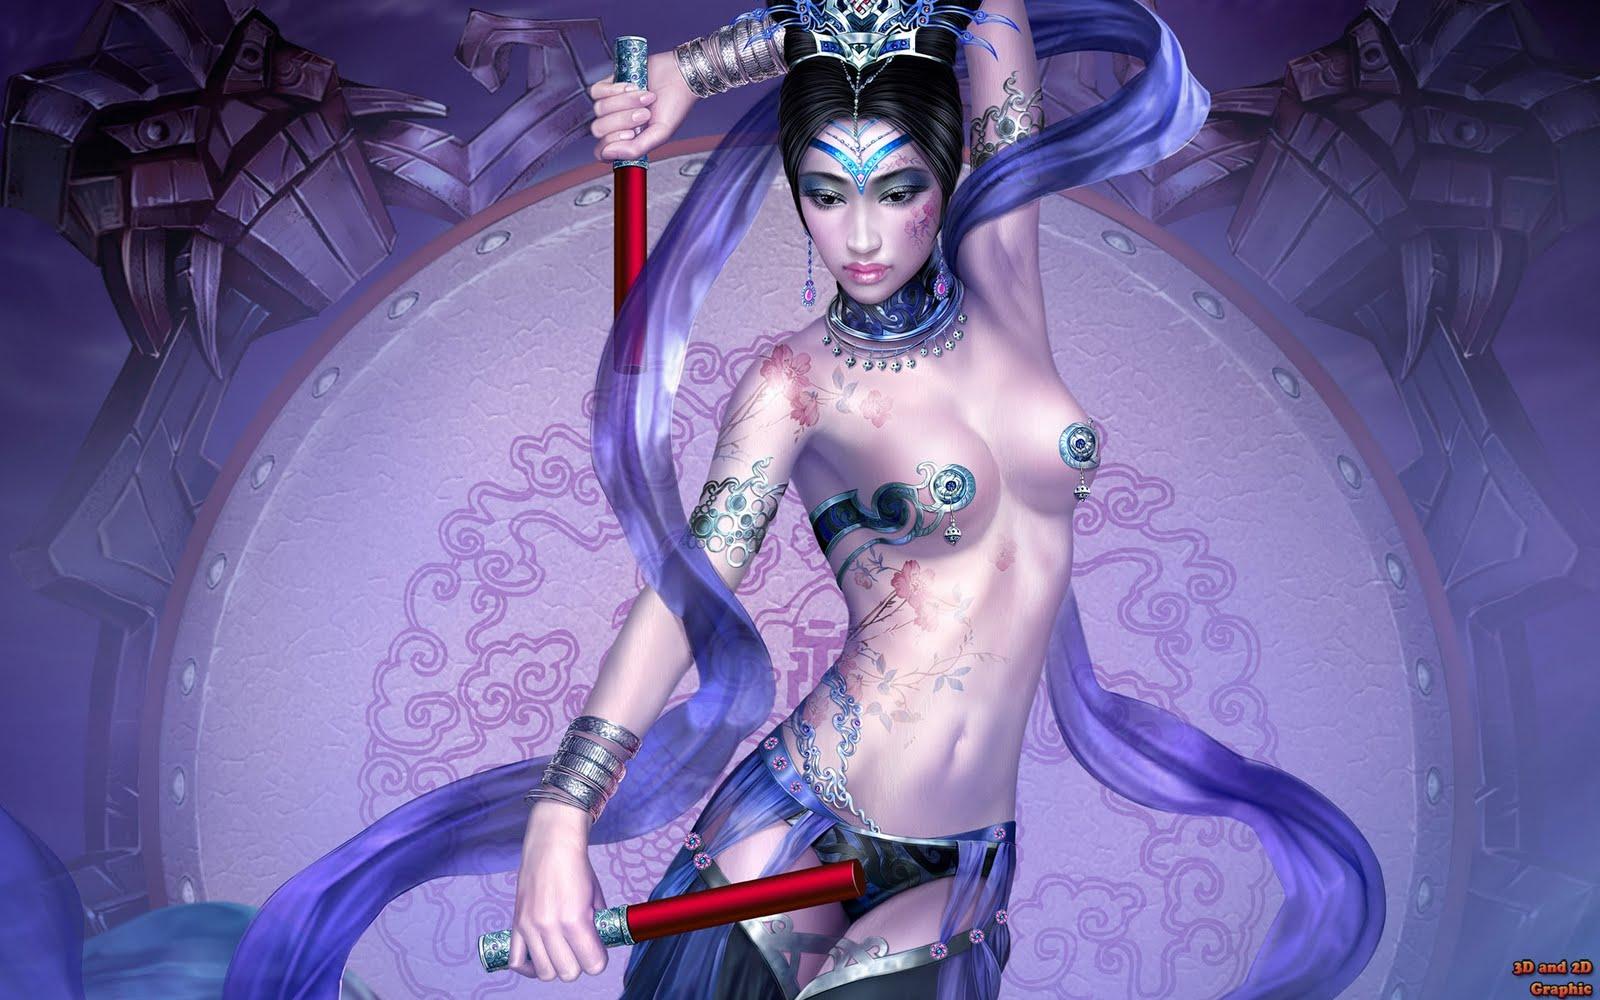 http://1.bp.blogspot.com/-WlB64iL_alM/ThNCSuAn4wI/AAAAAAAADZs/2V3mDYSPyf4/s1600/Wallcate.com+-+3D+charming+girls+Wallpaper+%252817%2529.jpg